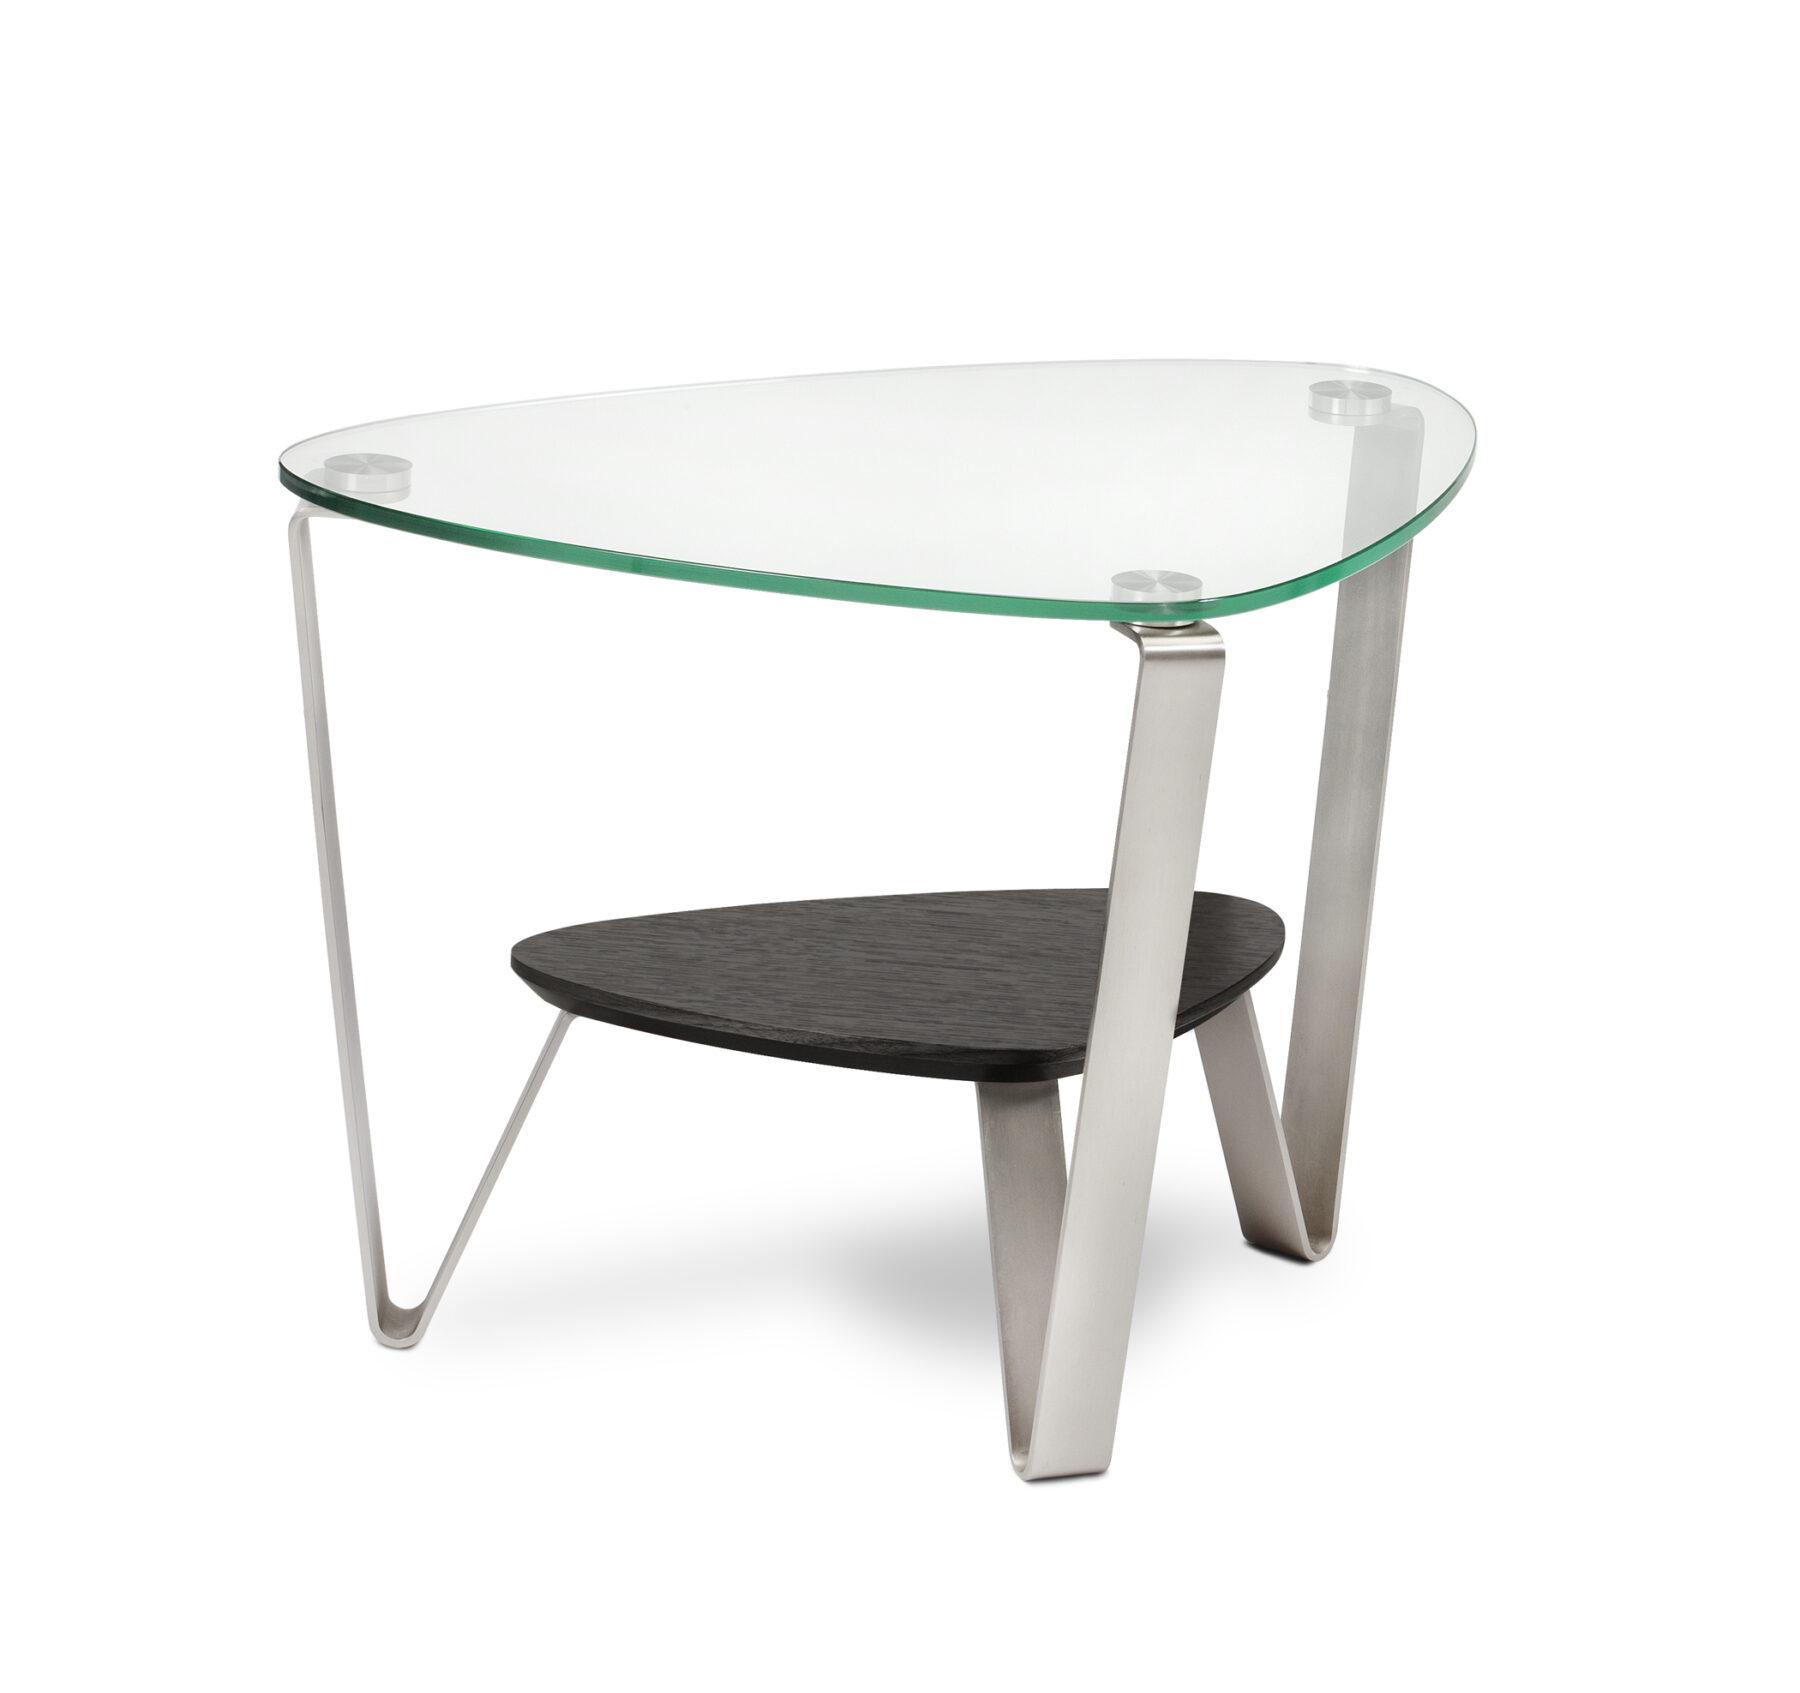 dino-1347-espresso-bdi-modern-coffee-table-1